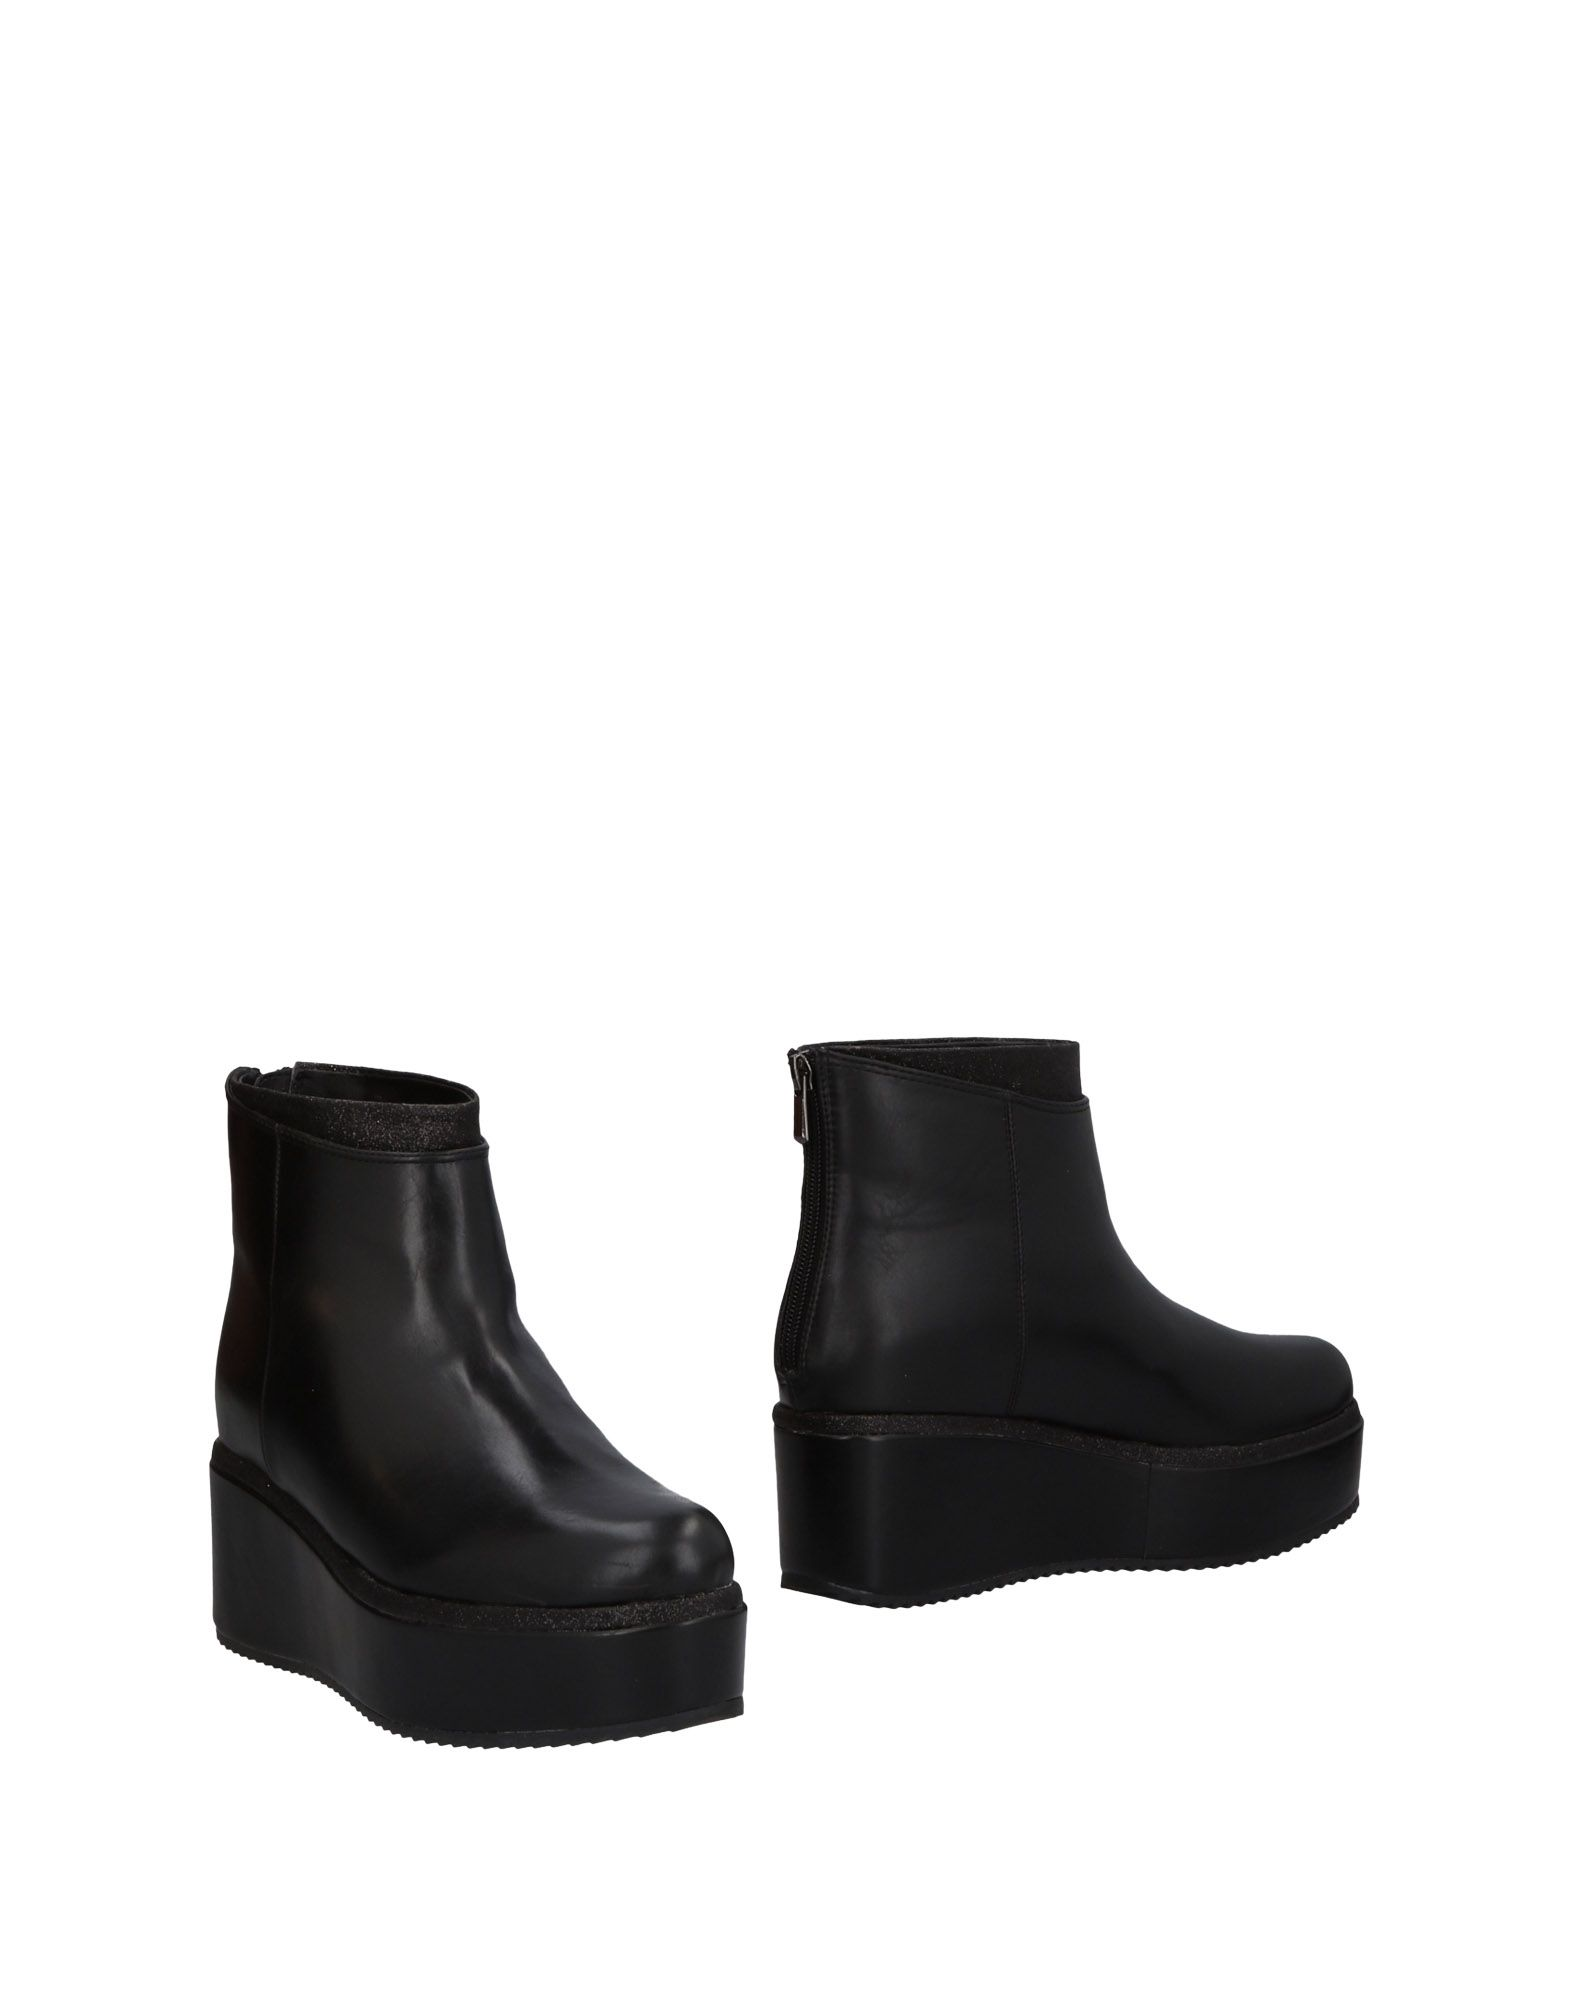 Cafènoir Stiefelette Damen  11477928LM Gute Qualität beliebte Schuhe